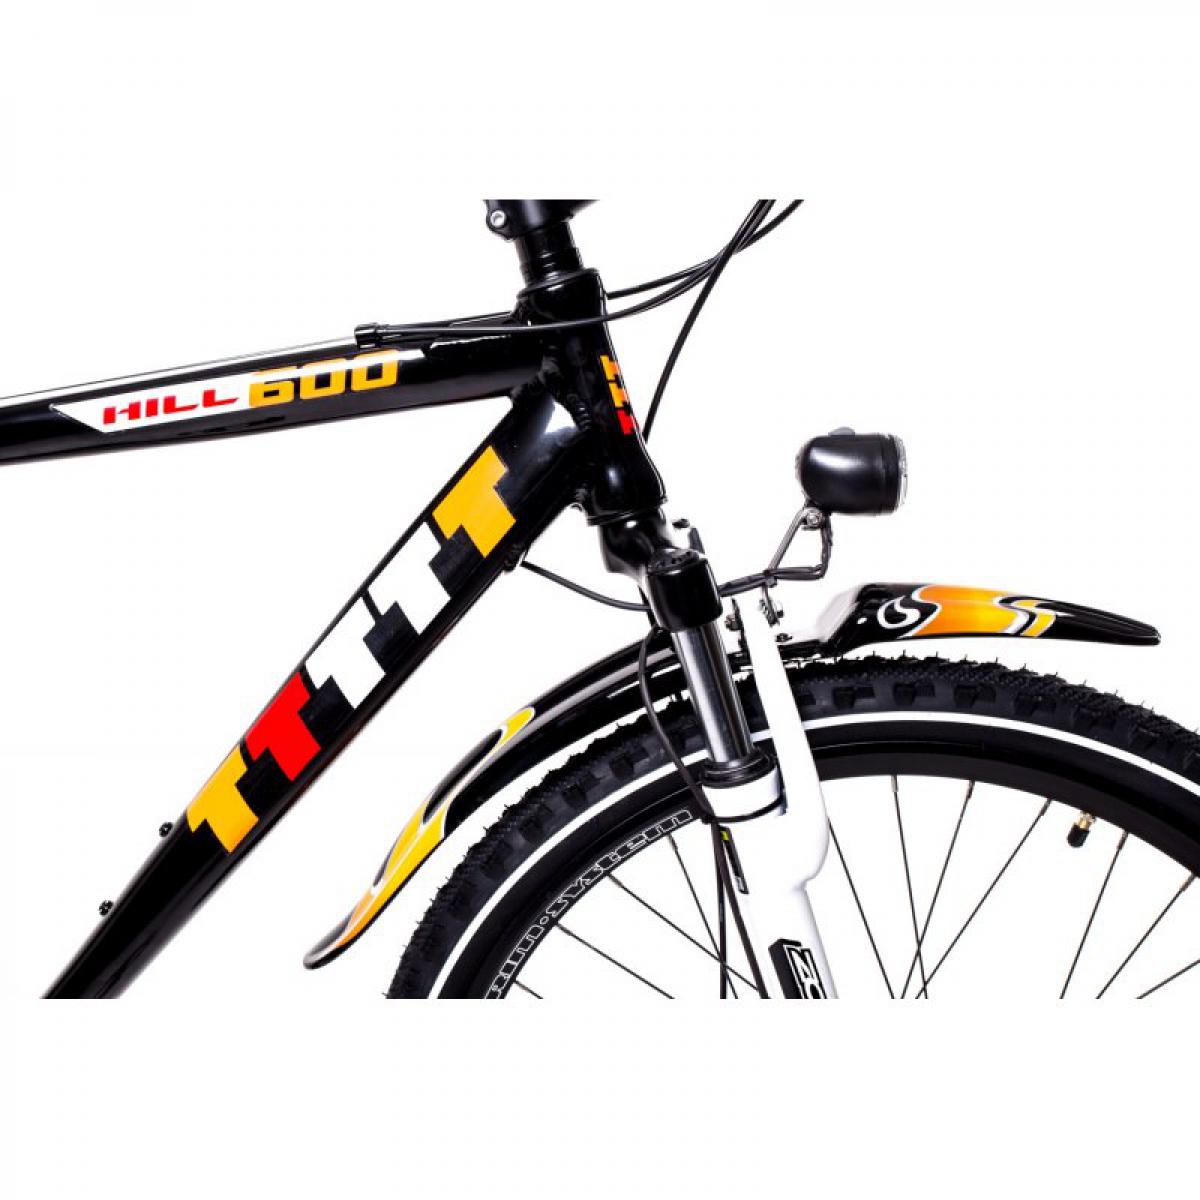 26 zoll mtb cross fahrrad bike shimano 21 gang stvzo disc schwarz ihr fahrrad online shop bei. Black Bedroom Furniture Sets. Home Design Ideas